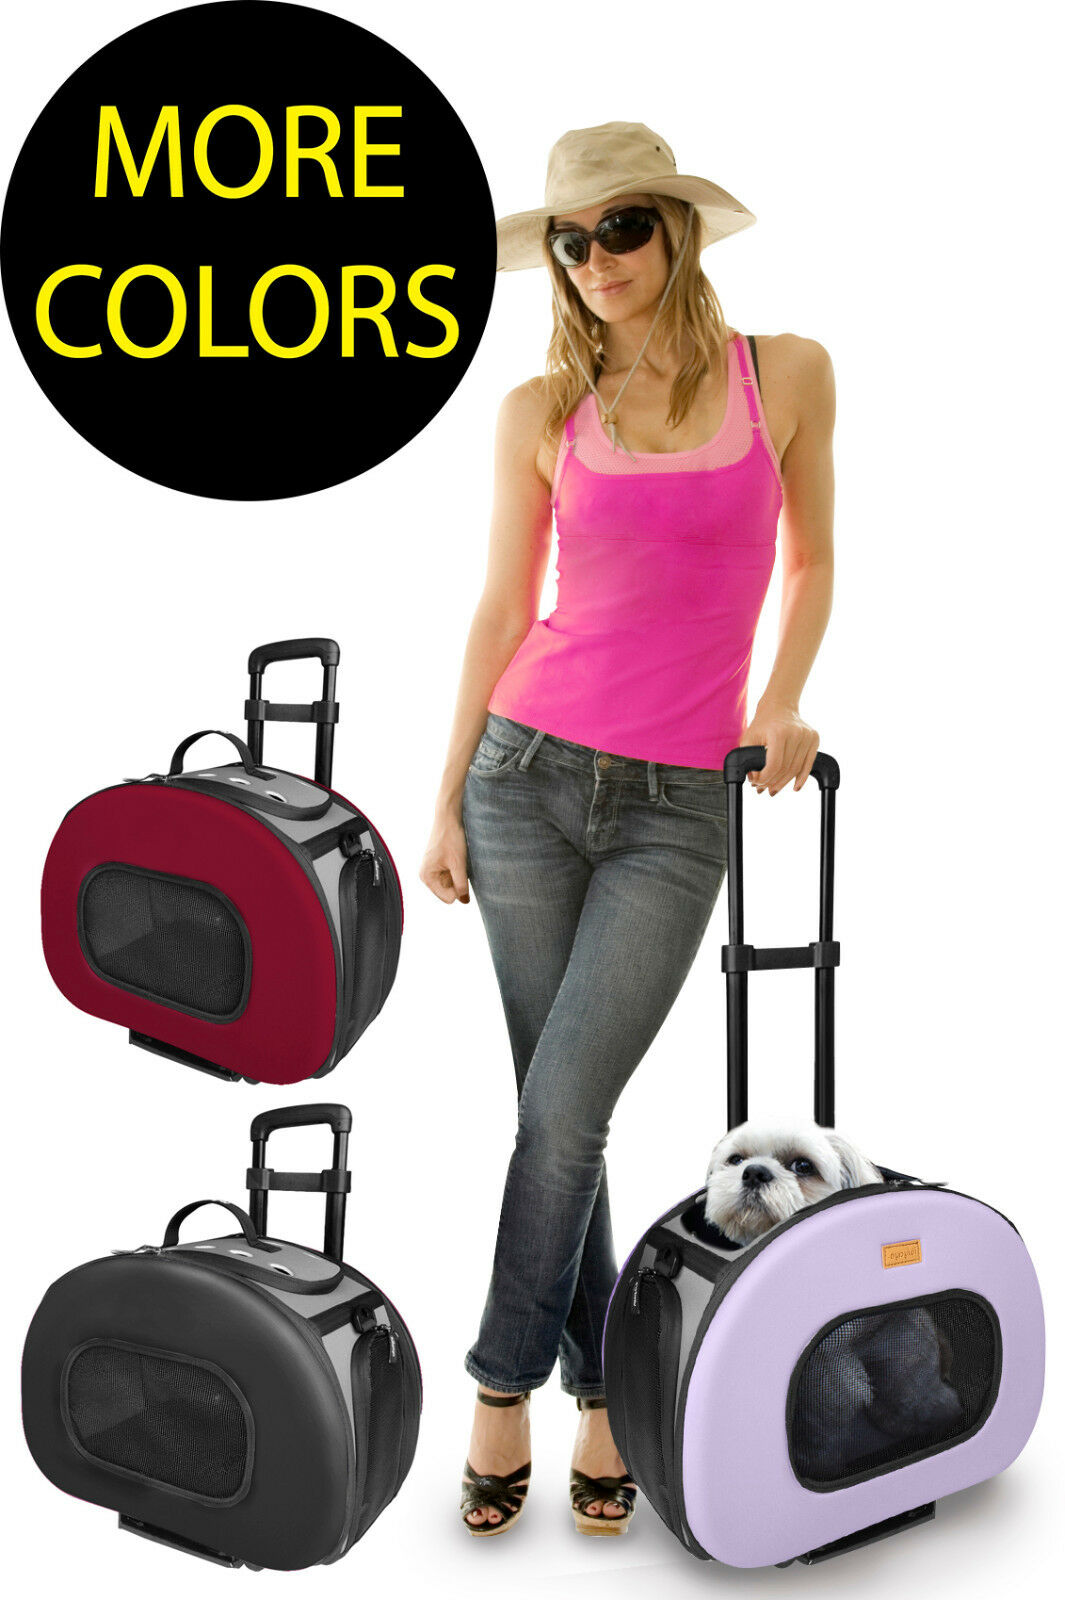 Tough-Shell Wheeled Collapsible Final Destination Travel Pet Dog Carrier Bag